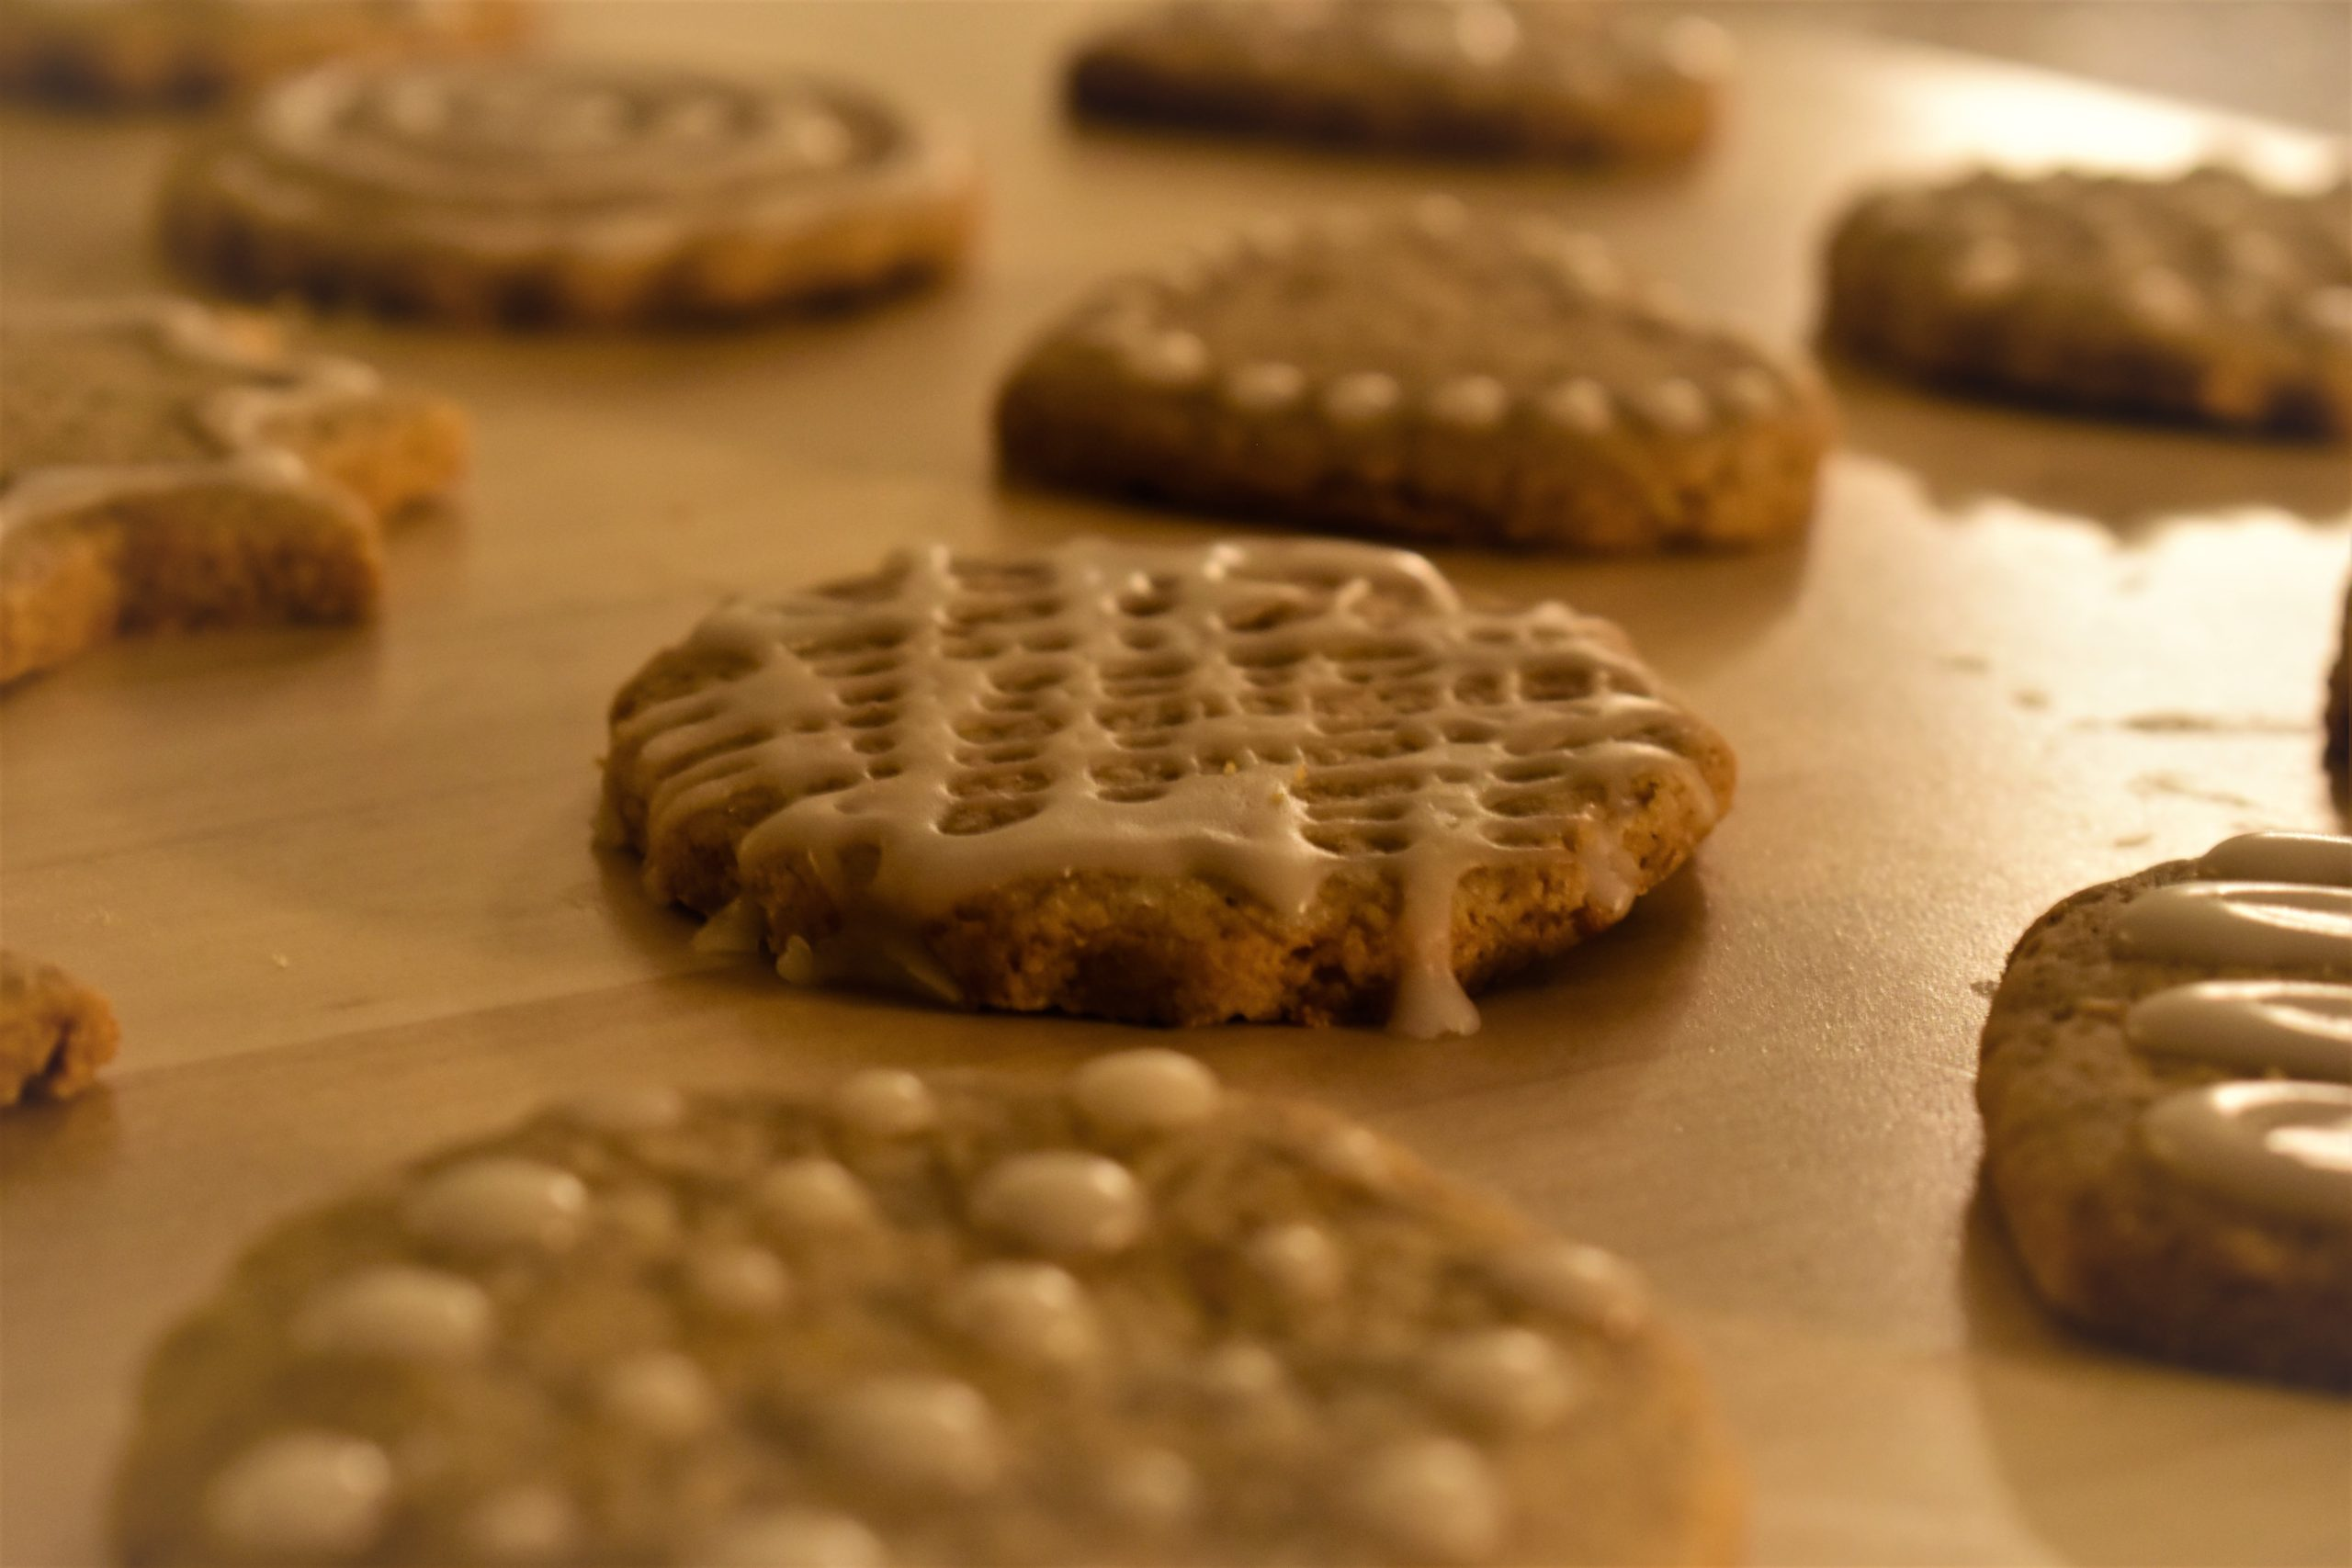 Swedish biscuits (Pepparkakor)